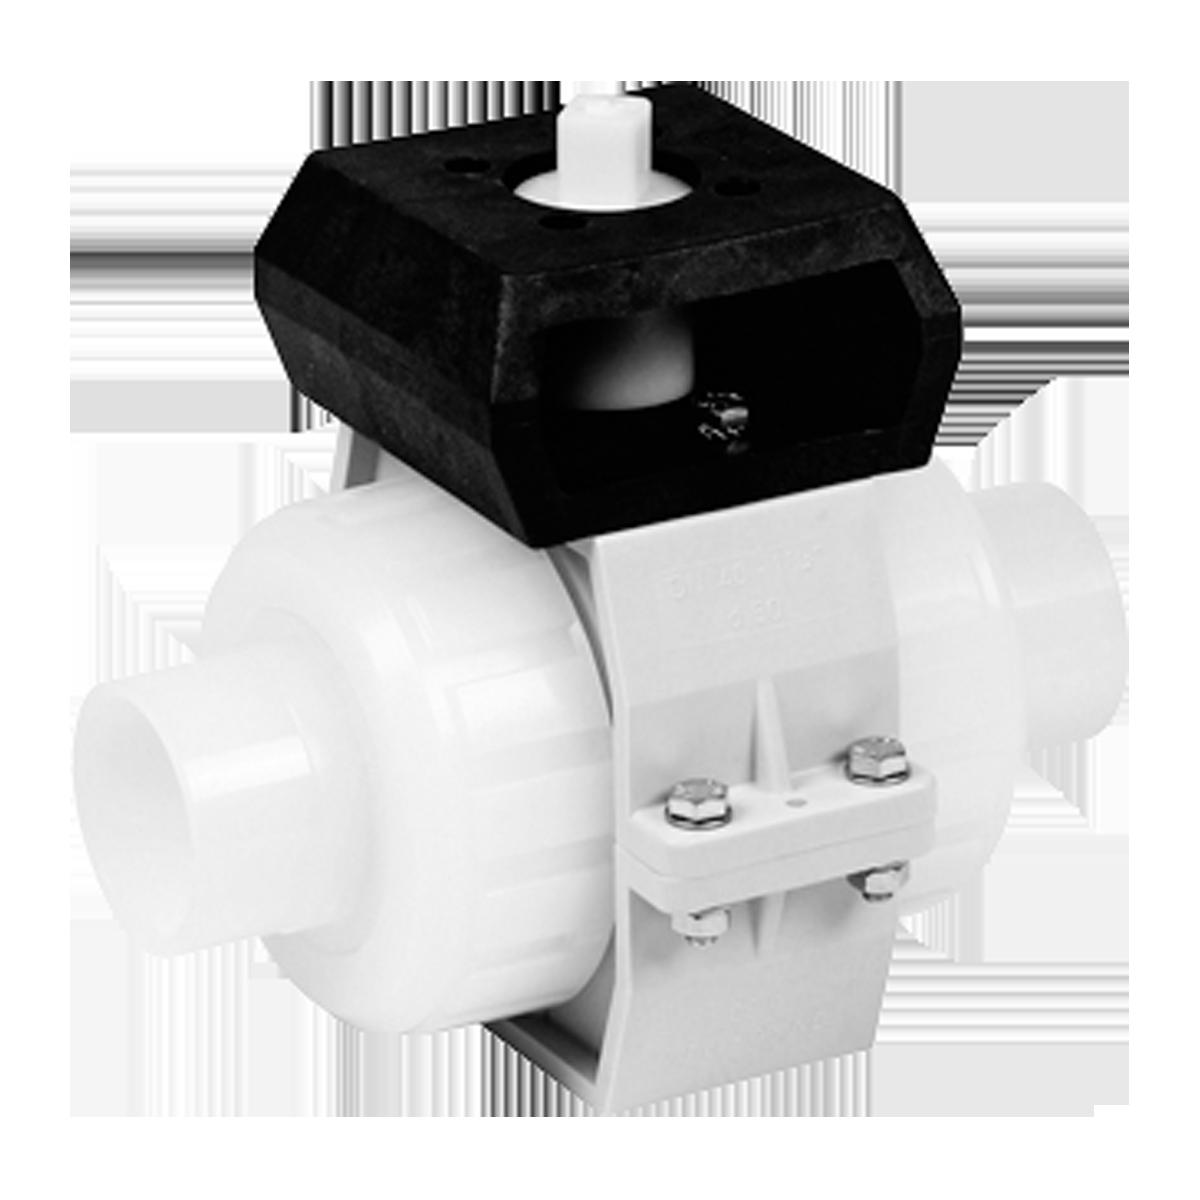 Praher 2-way ball valve S4 PVDF with adapter set, white, black